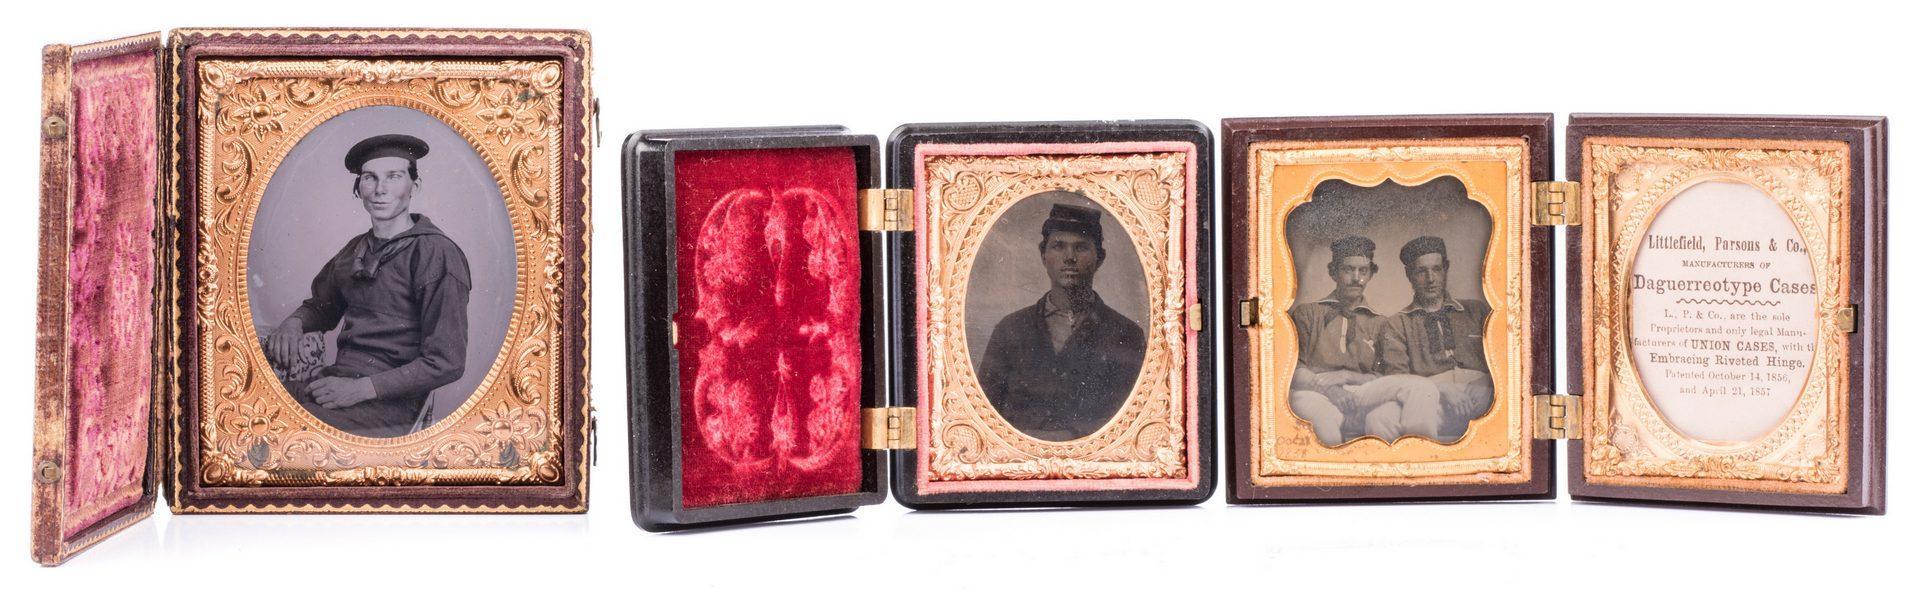 Lot 199: 2 Civil War Union Tintypes & 1 Ambrotype